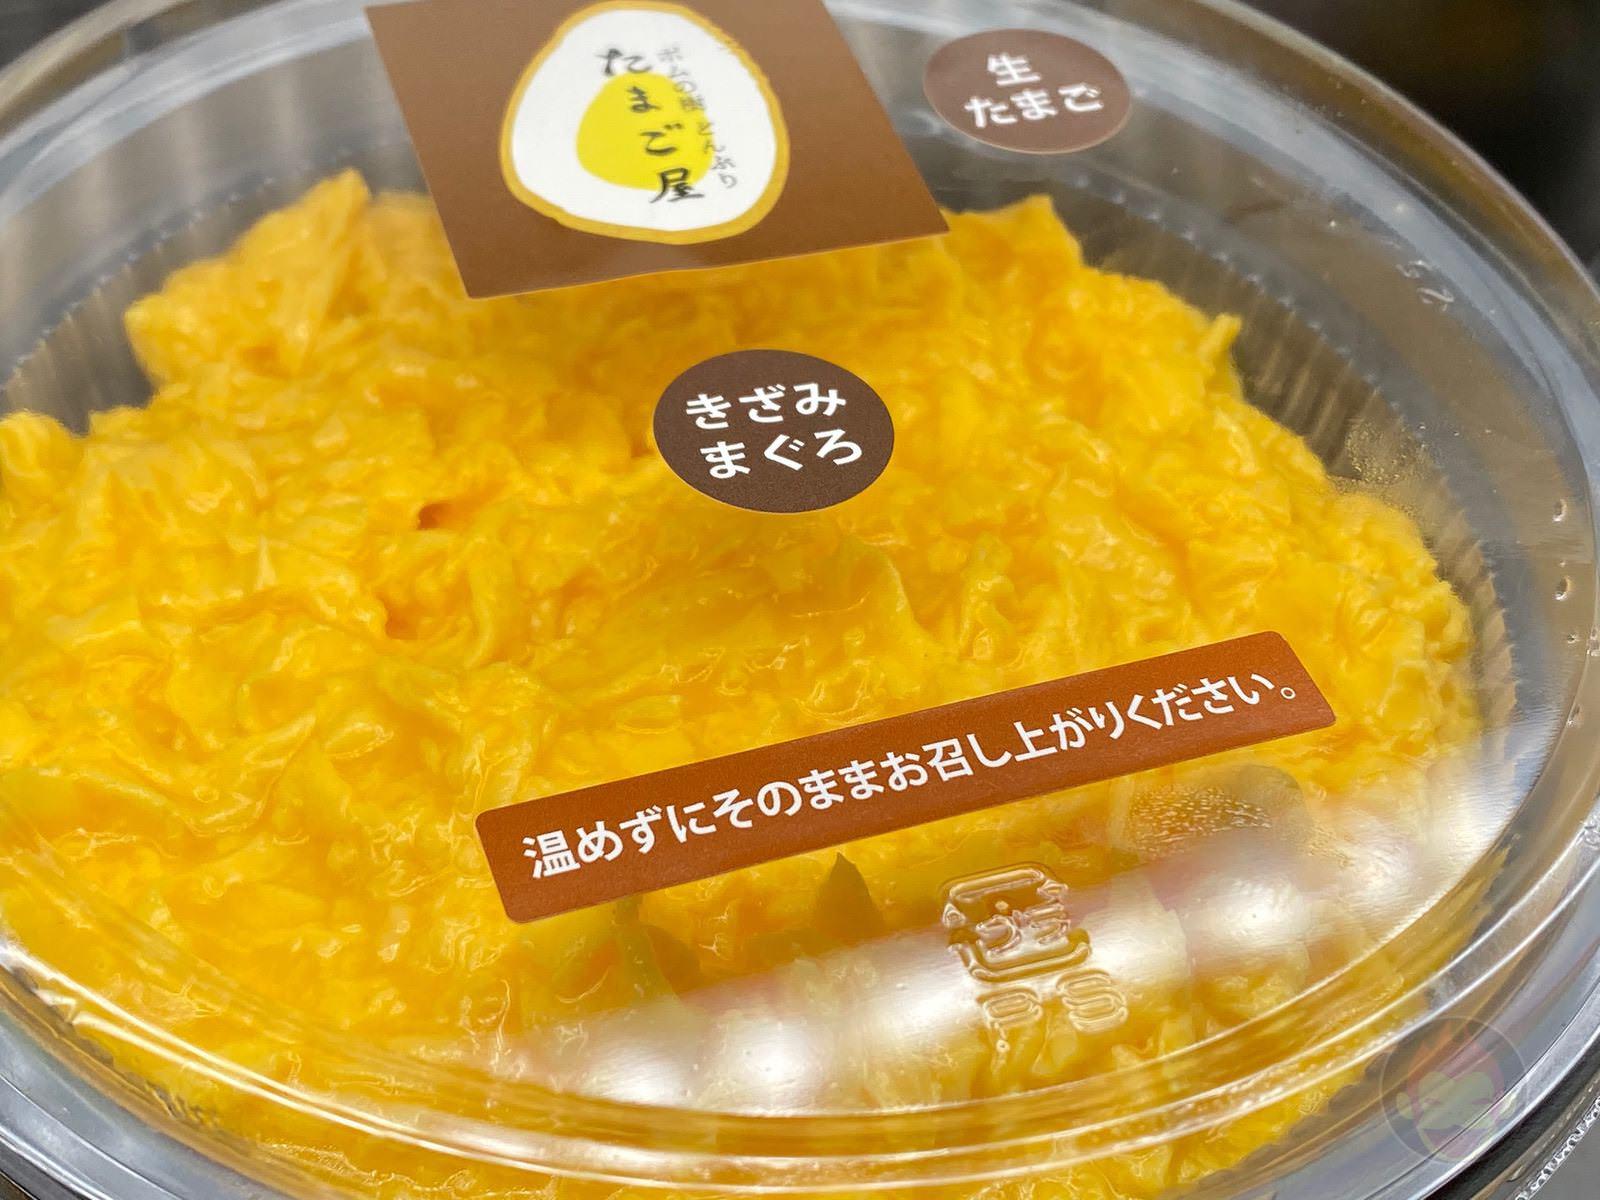 Shibuya-Scramble-Square-Food-I-Ate-108.jpeg